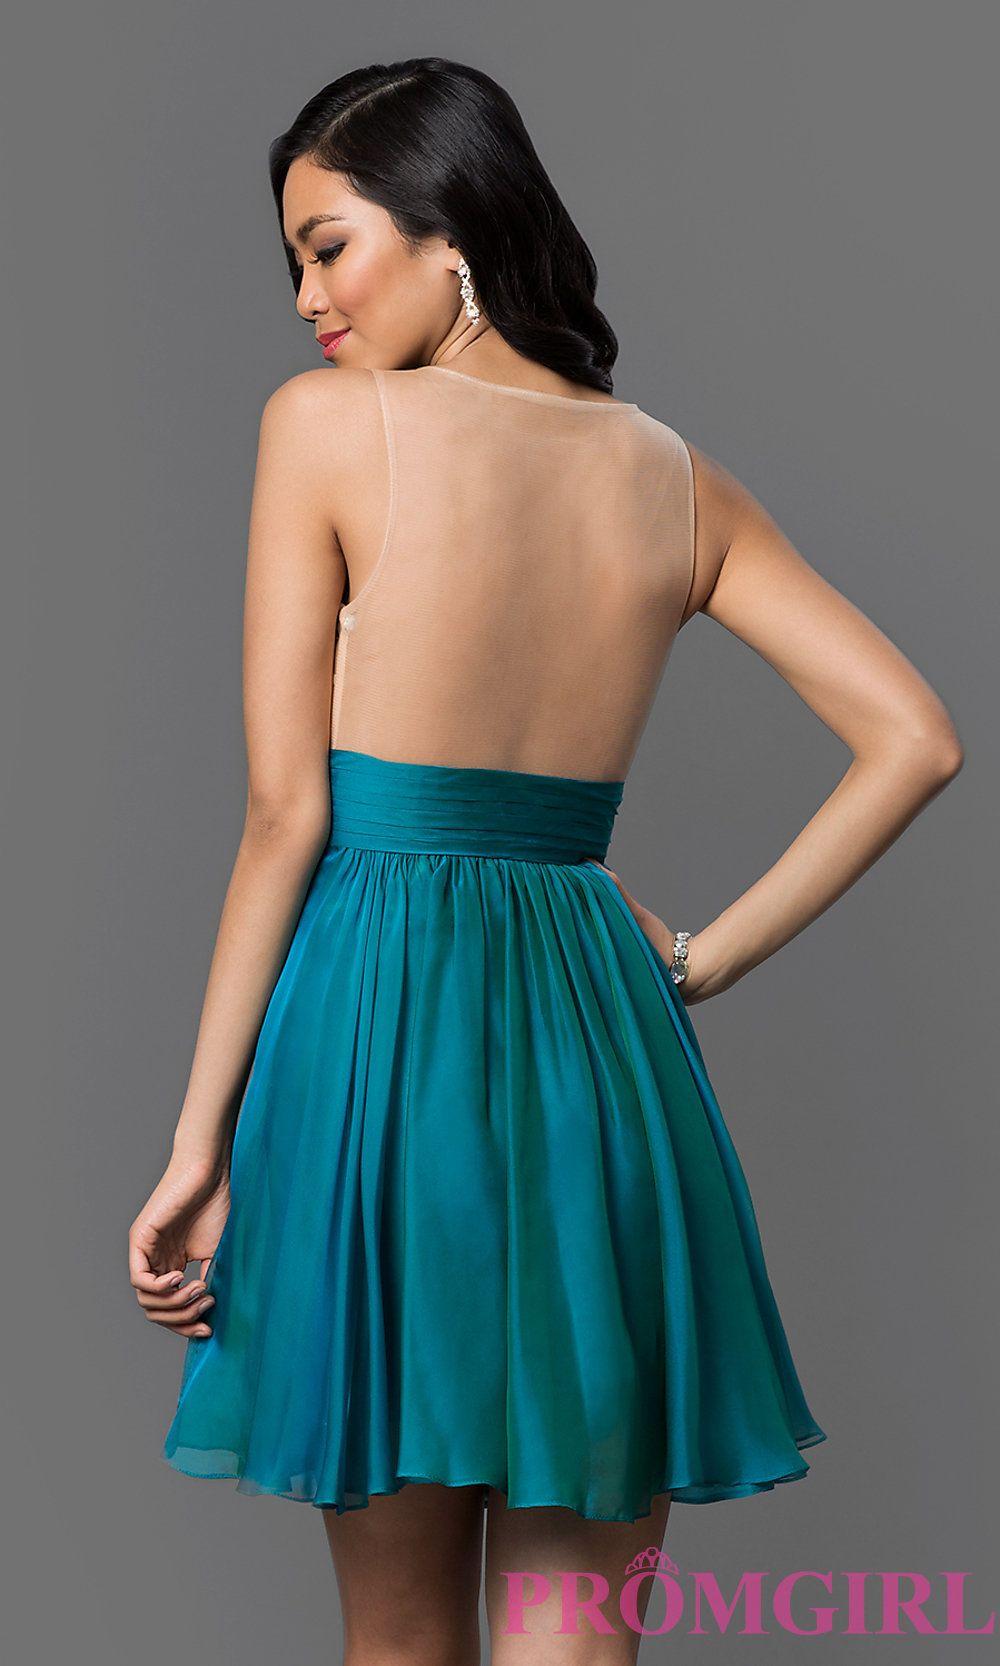 Dress Back Image | My closet (I wish) | Pinterest | Homecoming ...